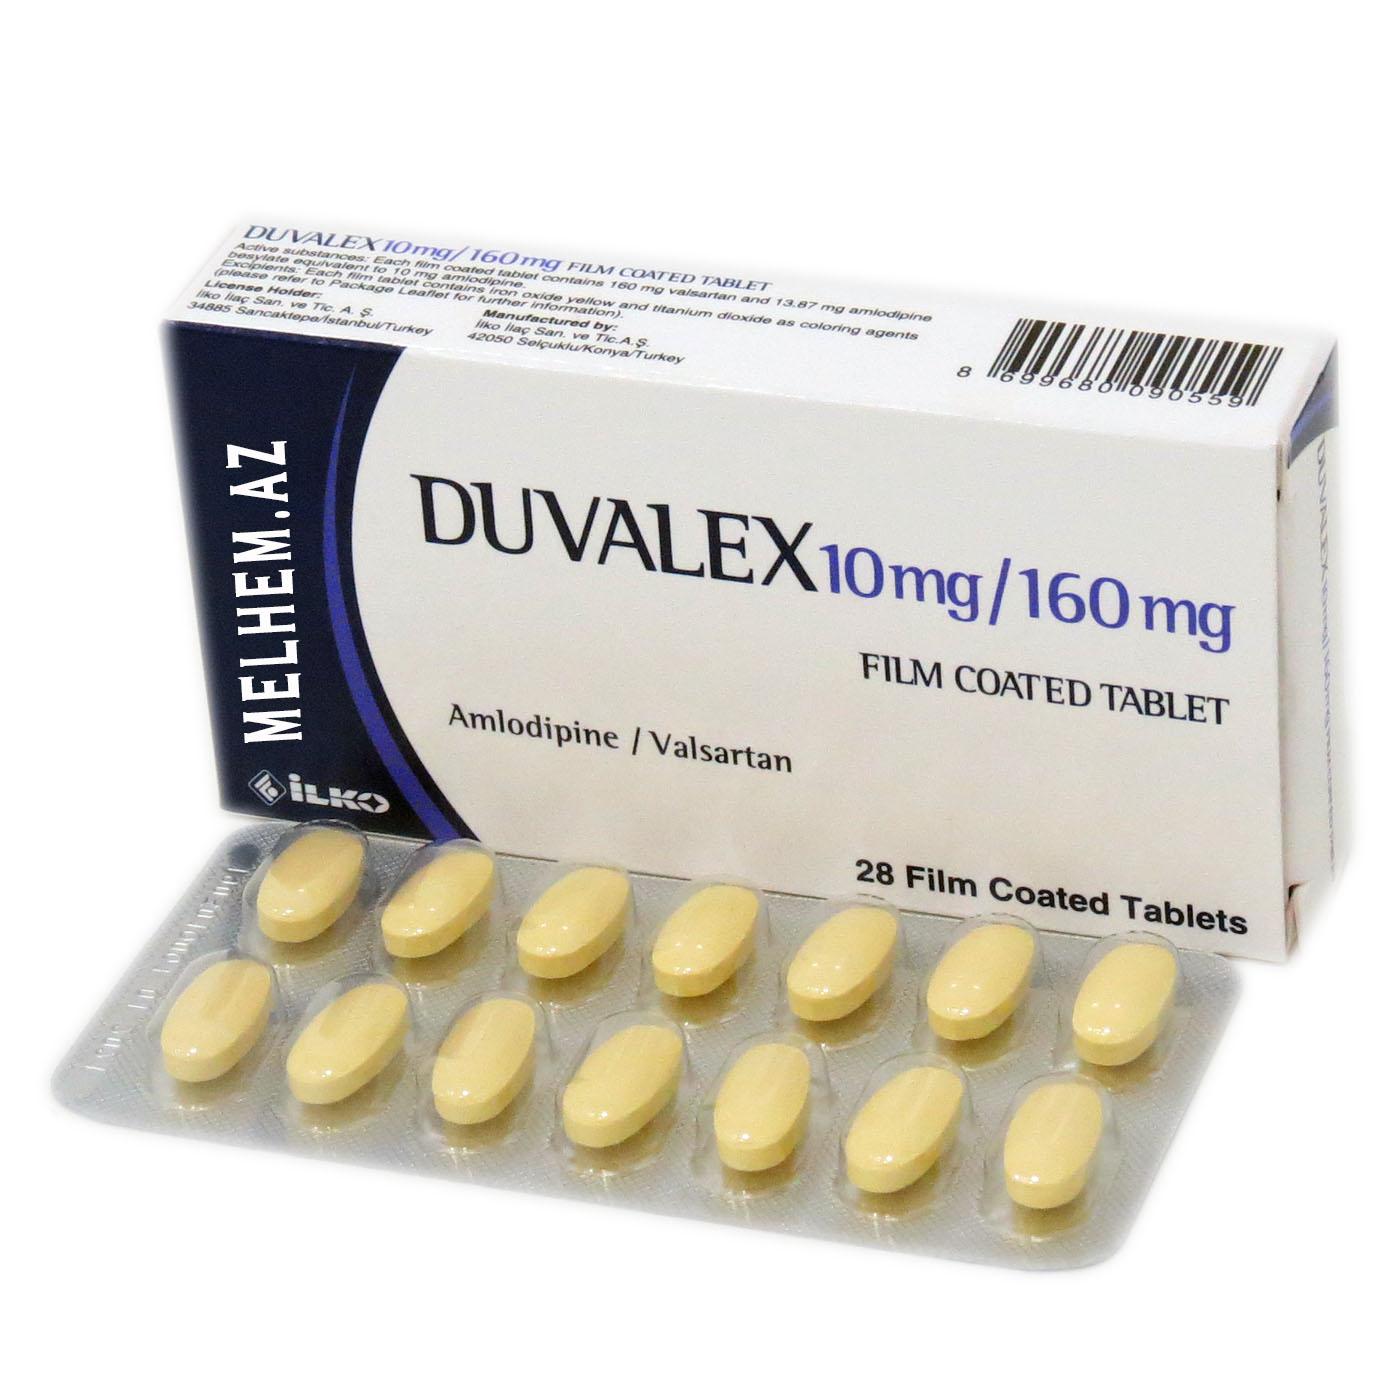 DUVALEX 10MG/160MG